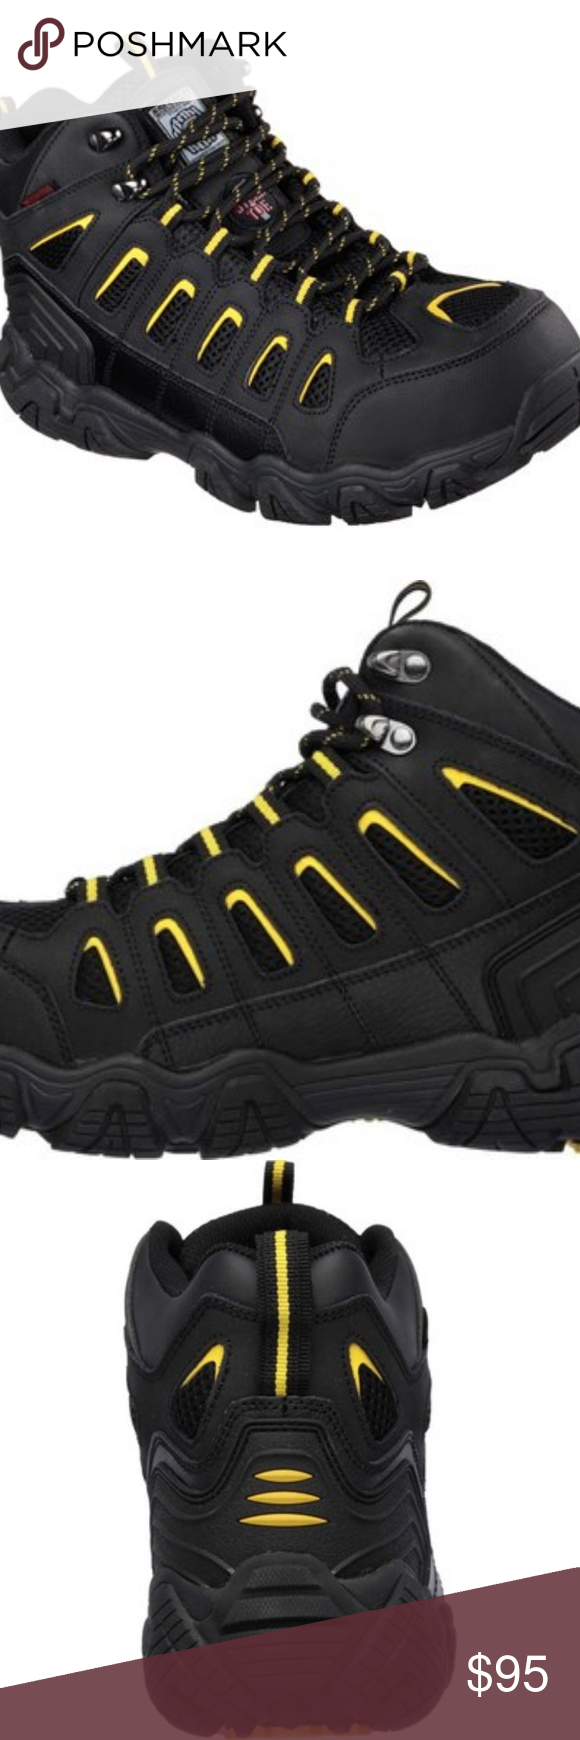 4f9fbe88d9eb9 Skechers Blais Bixford Steel Toe Work Boots 10.5 Brand new pair of Mens  Skechers Blais Bixford